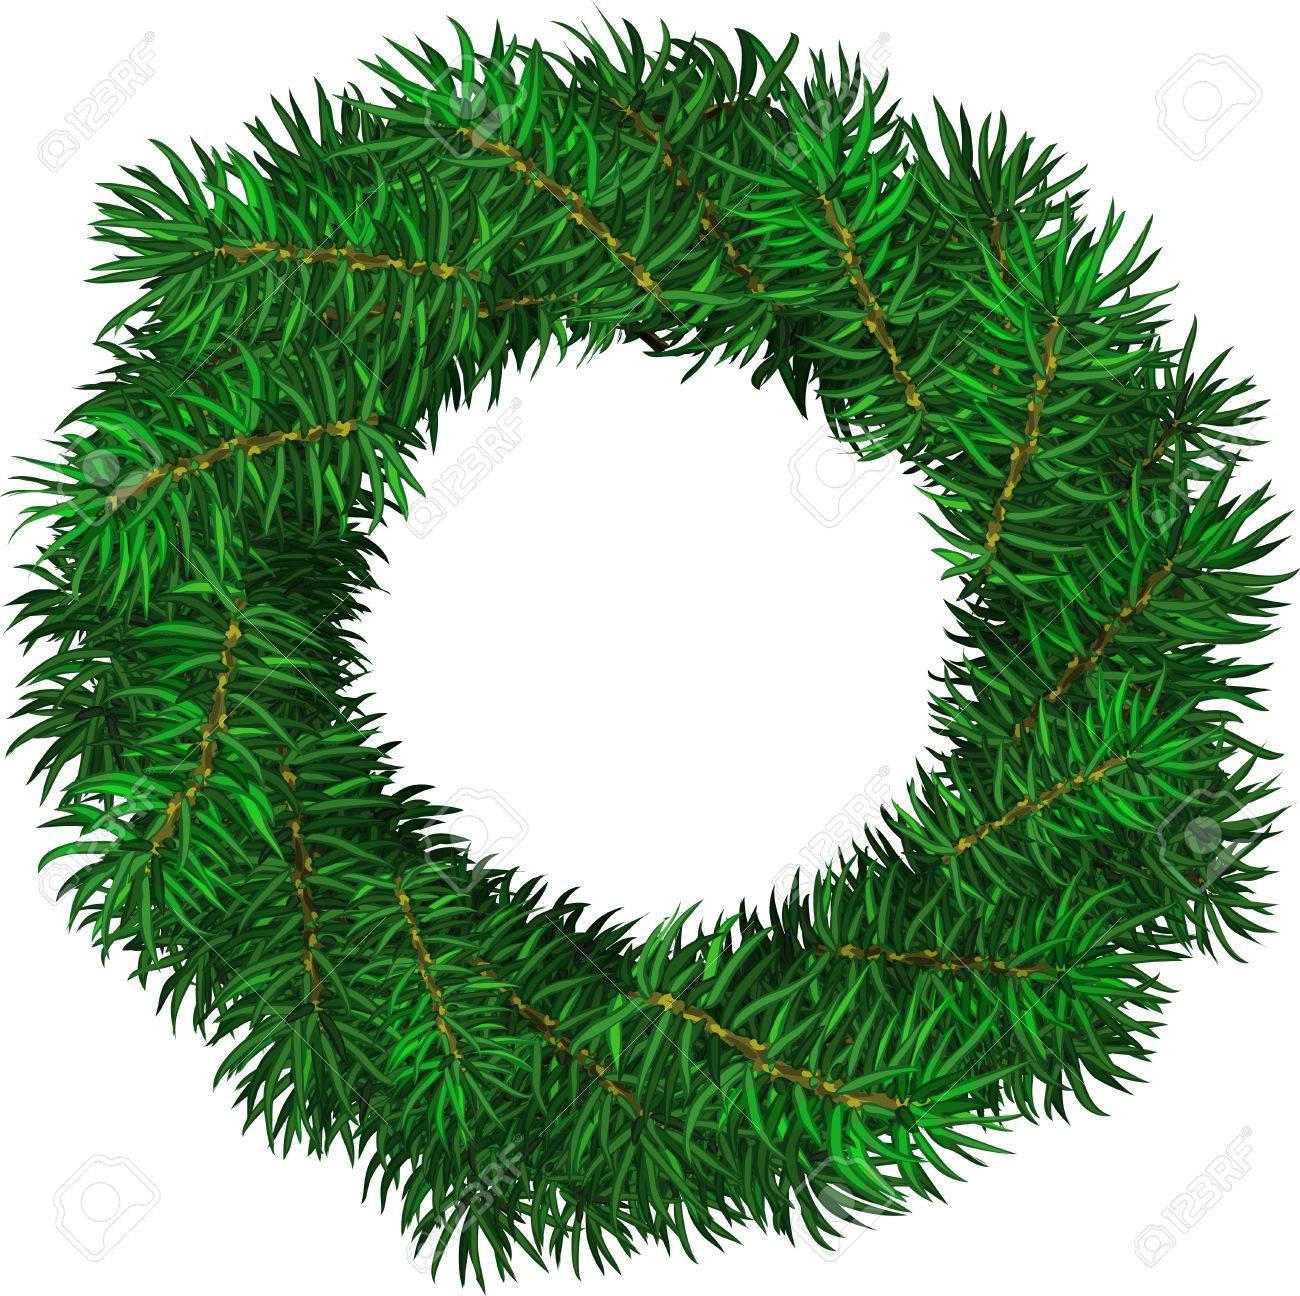 Simple Evergreen Holiday Wreath In Circular Shape Vector Isolated Rh 123rf Com Frame Clip Art